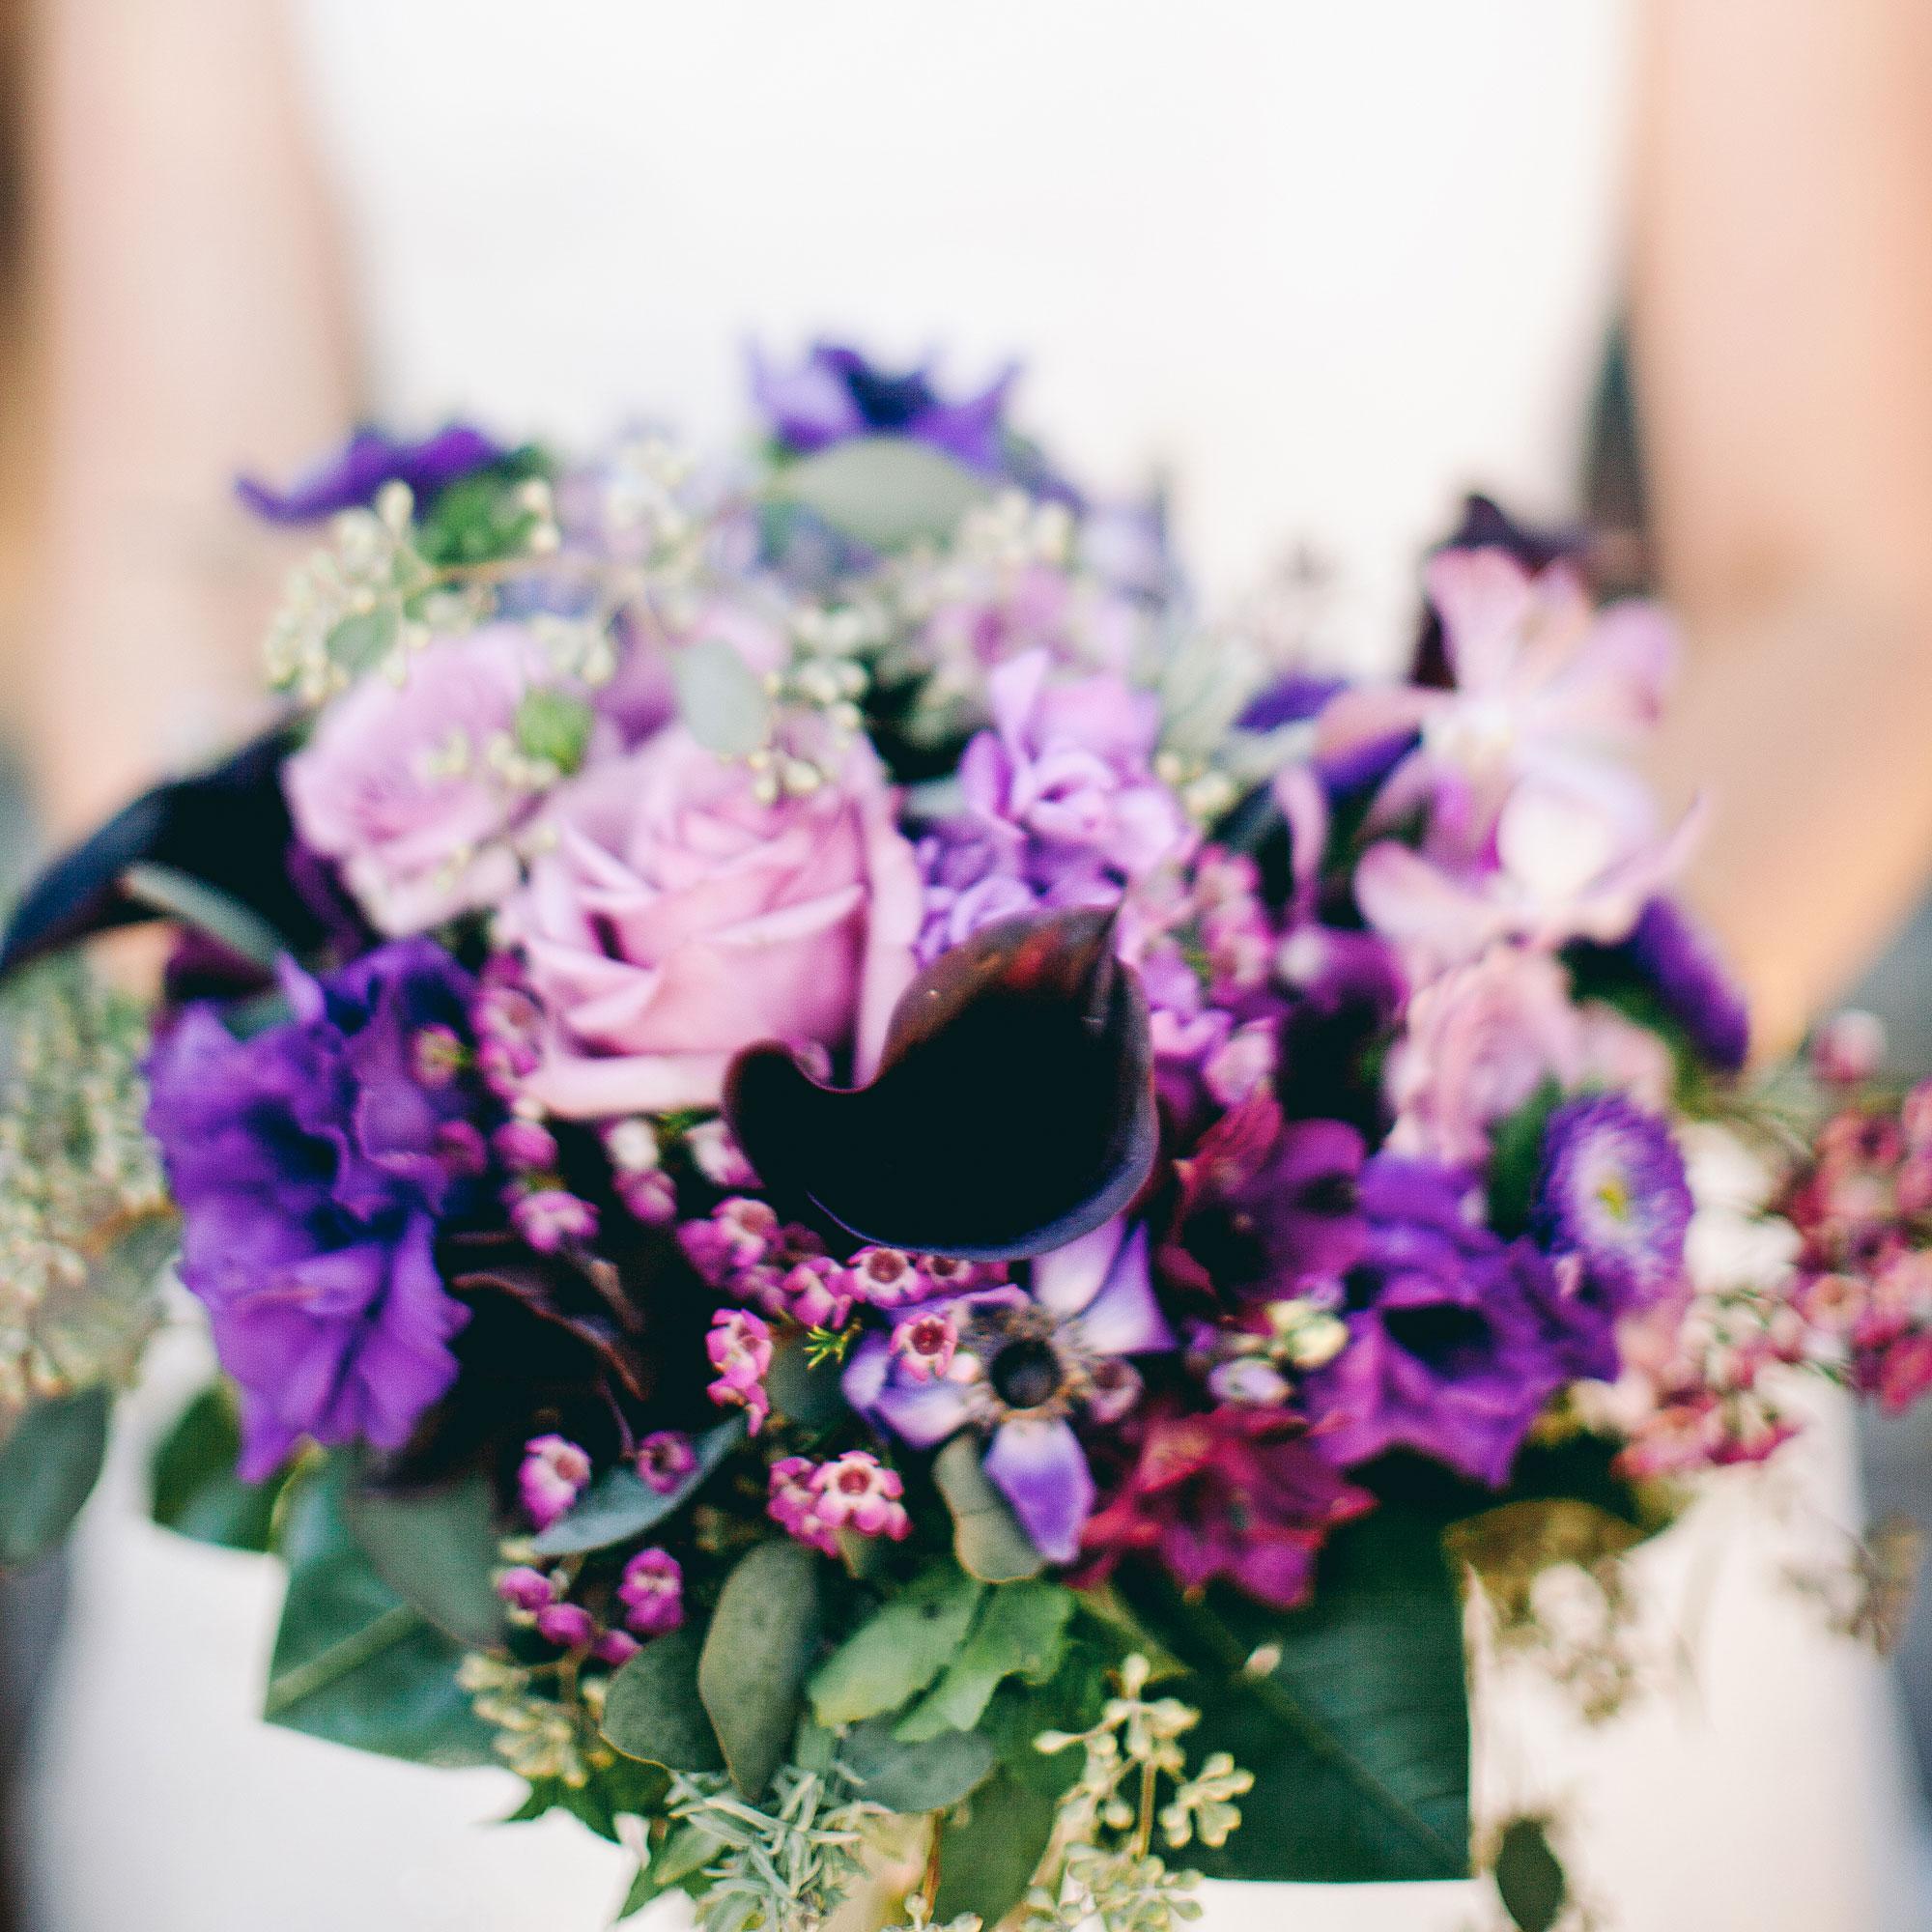 Bokeh Flowers Wedding: 29 Must-Have Wedding Bouquets